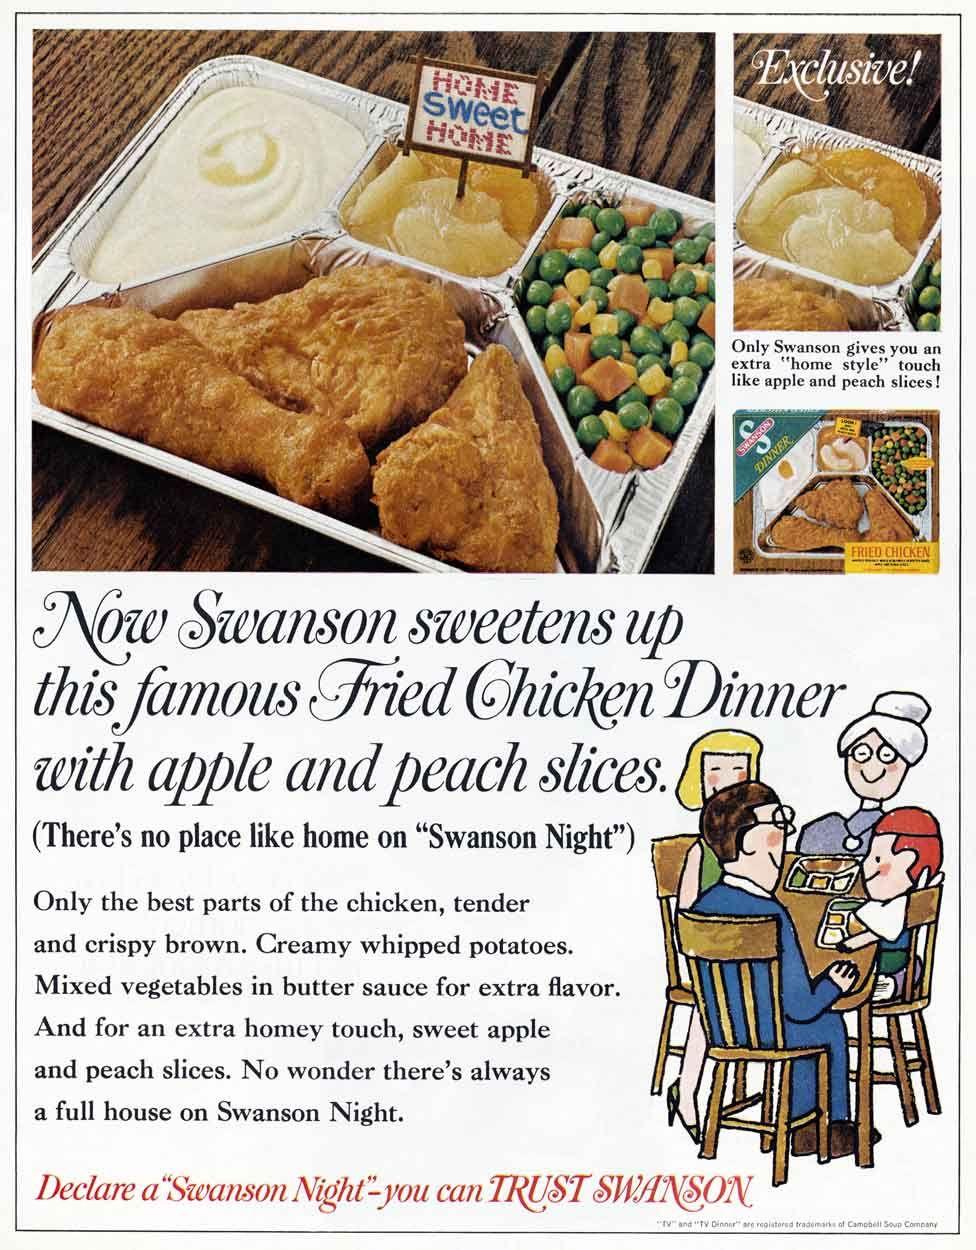 An advert for a Swanson TV dinner